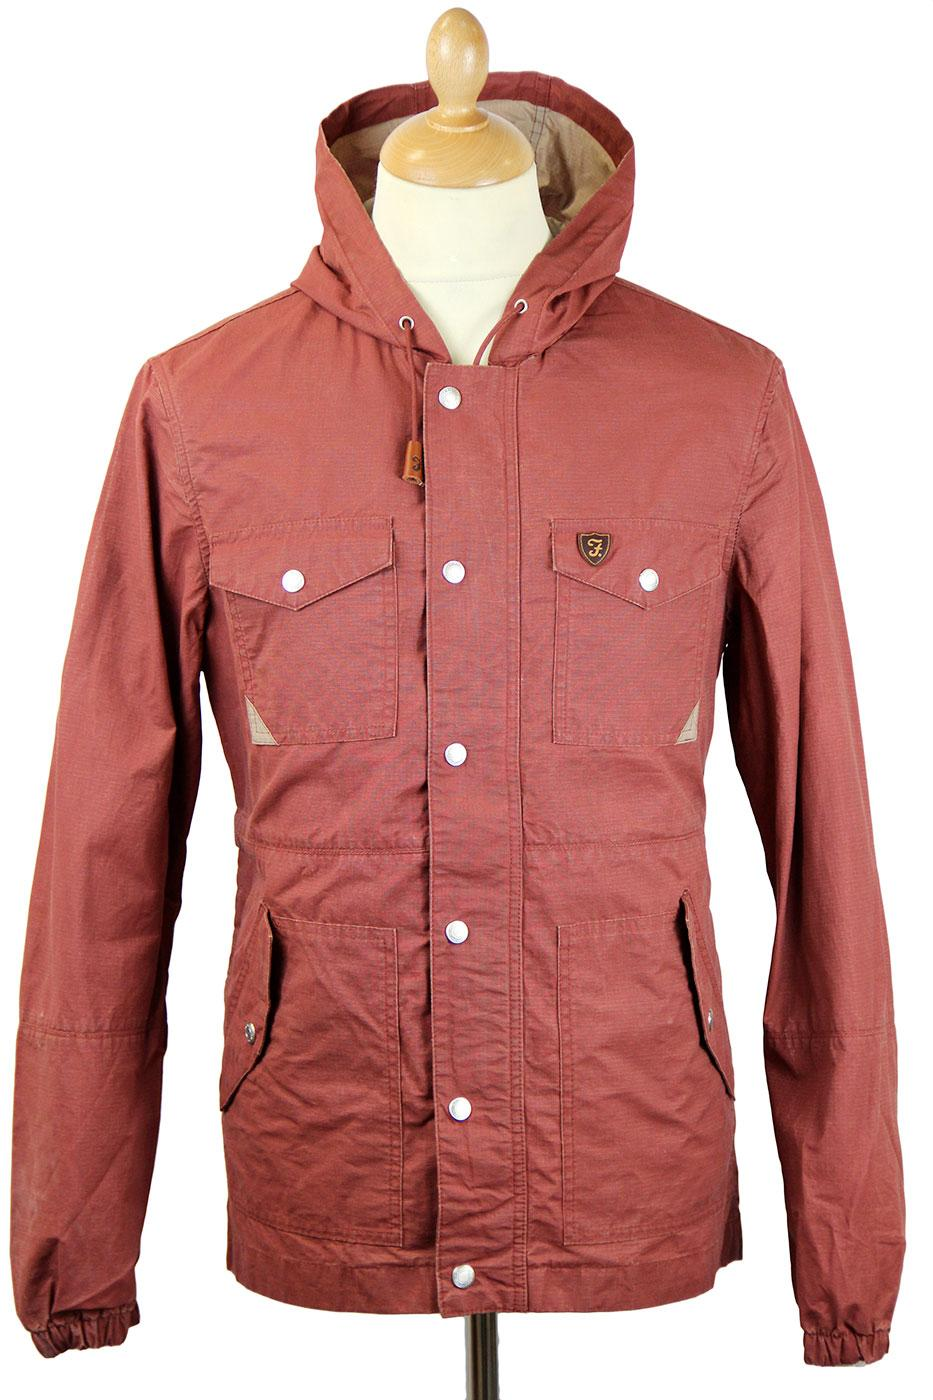 Boughton FARAH VINTAGE Mod 4 Pkt Rip Stop Jacket F